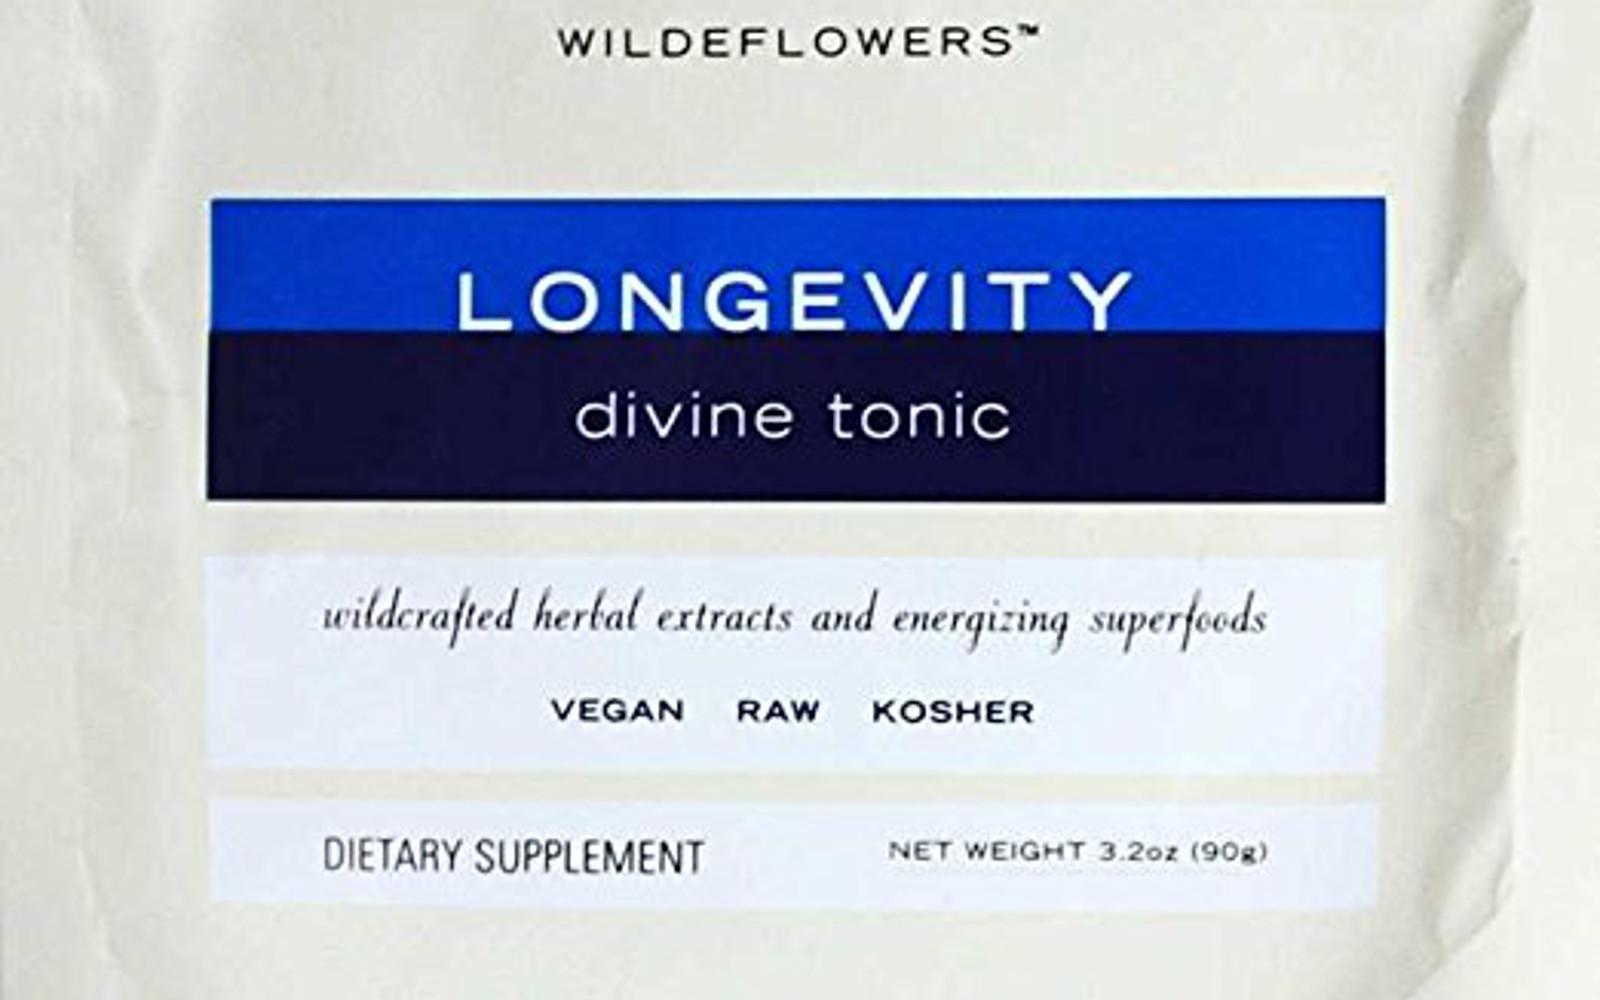 Wildeflowers Longevity Divine Tonic Hot Chocolate Mix - Organic, Natural, Kosher, Vegan, Gluten Free, Rich In Zinc And Iron With Raw Cacao, 3.2 Ounces